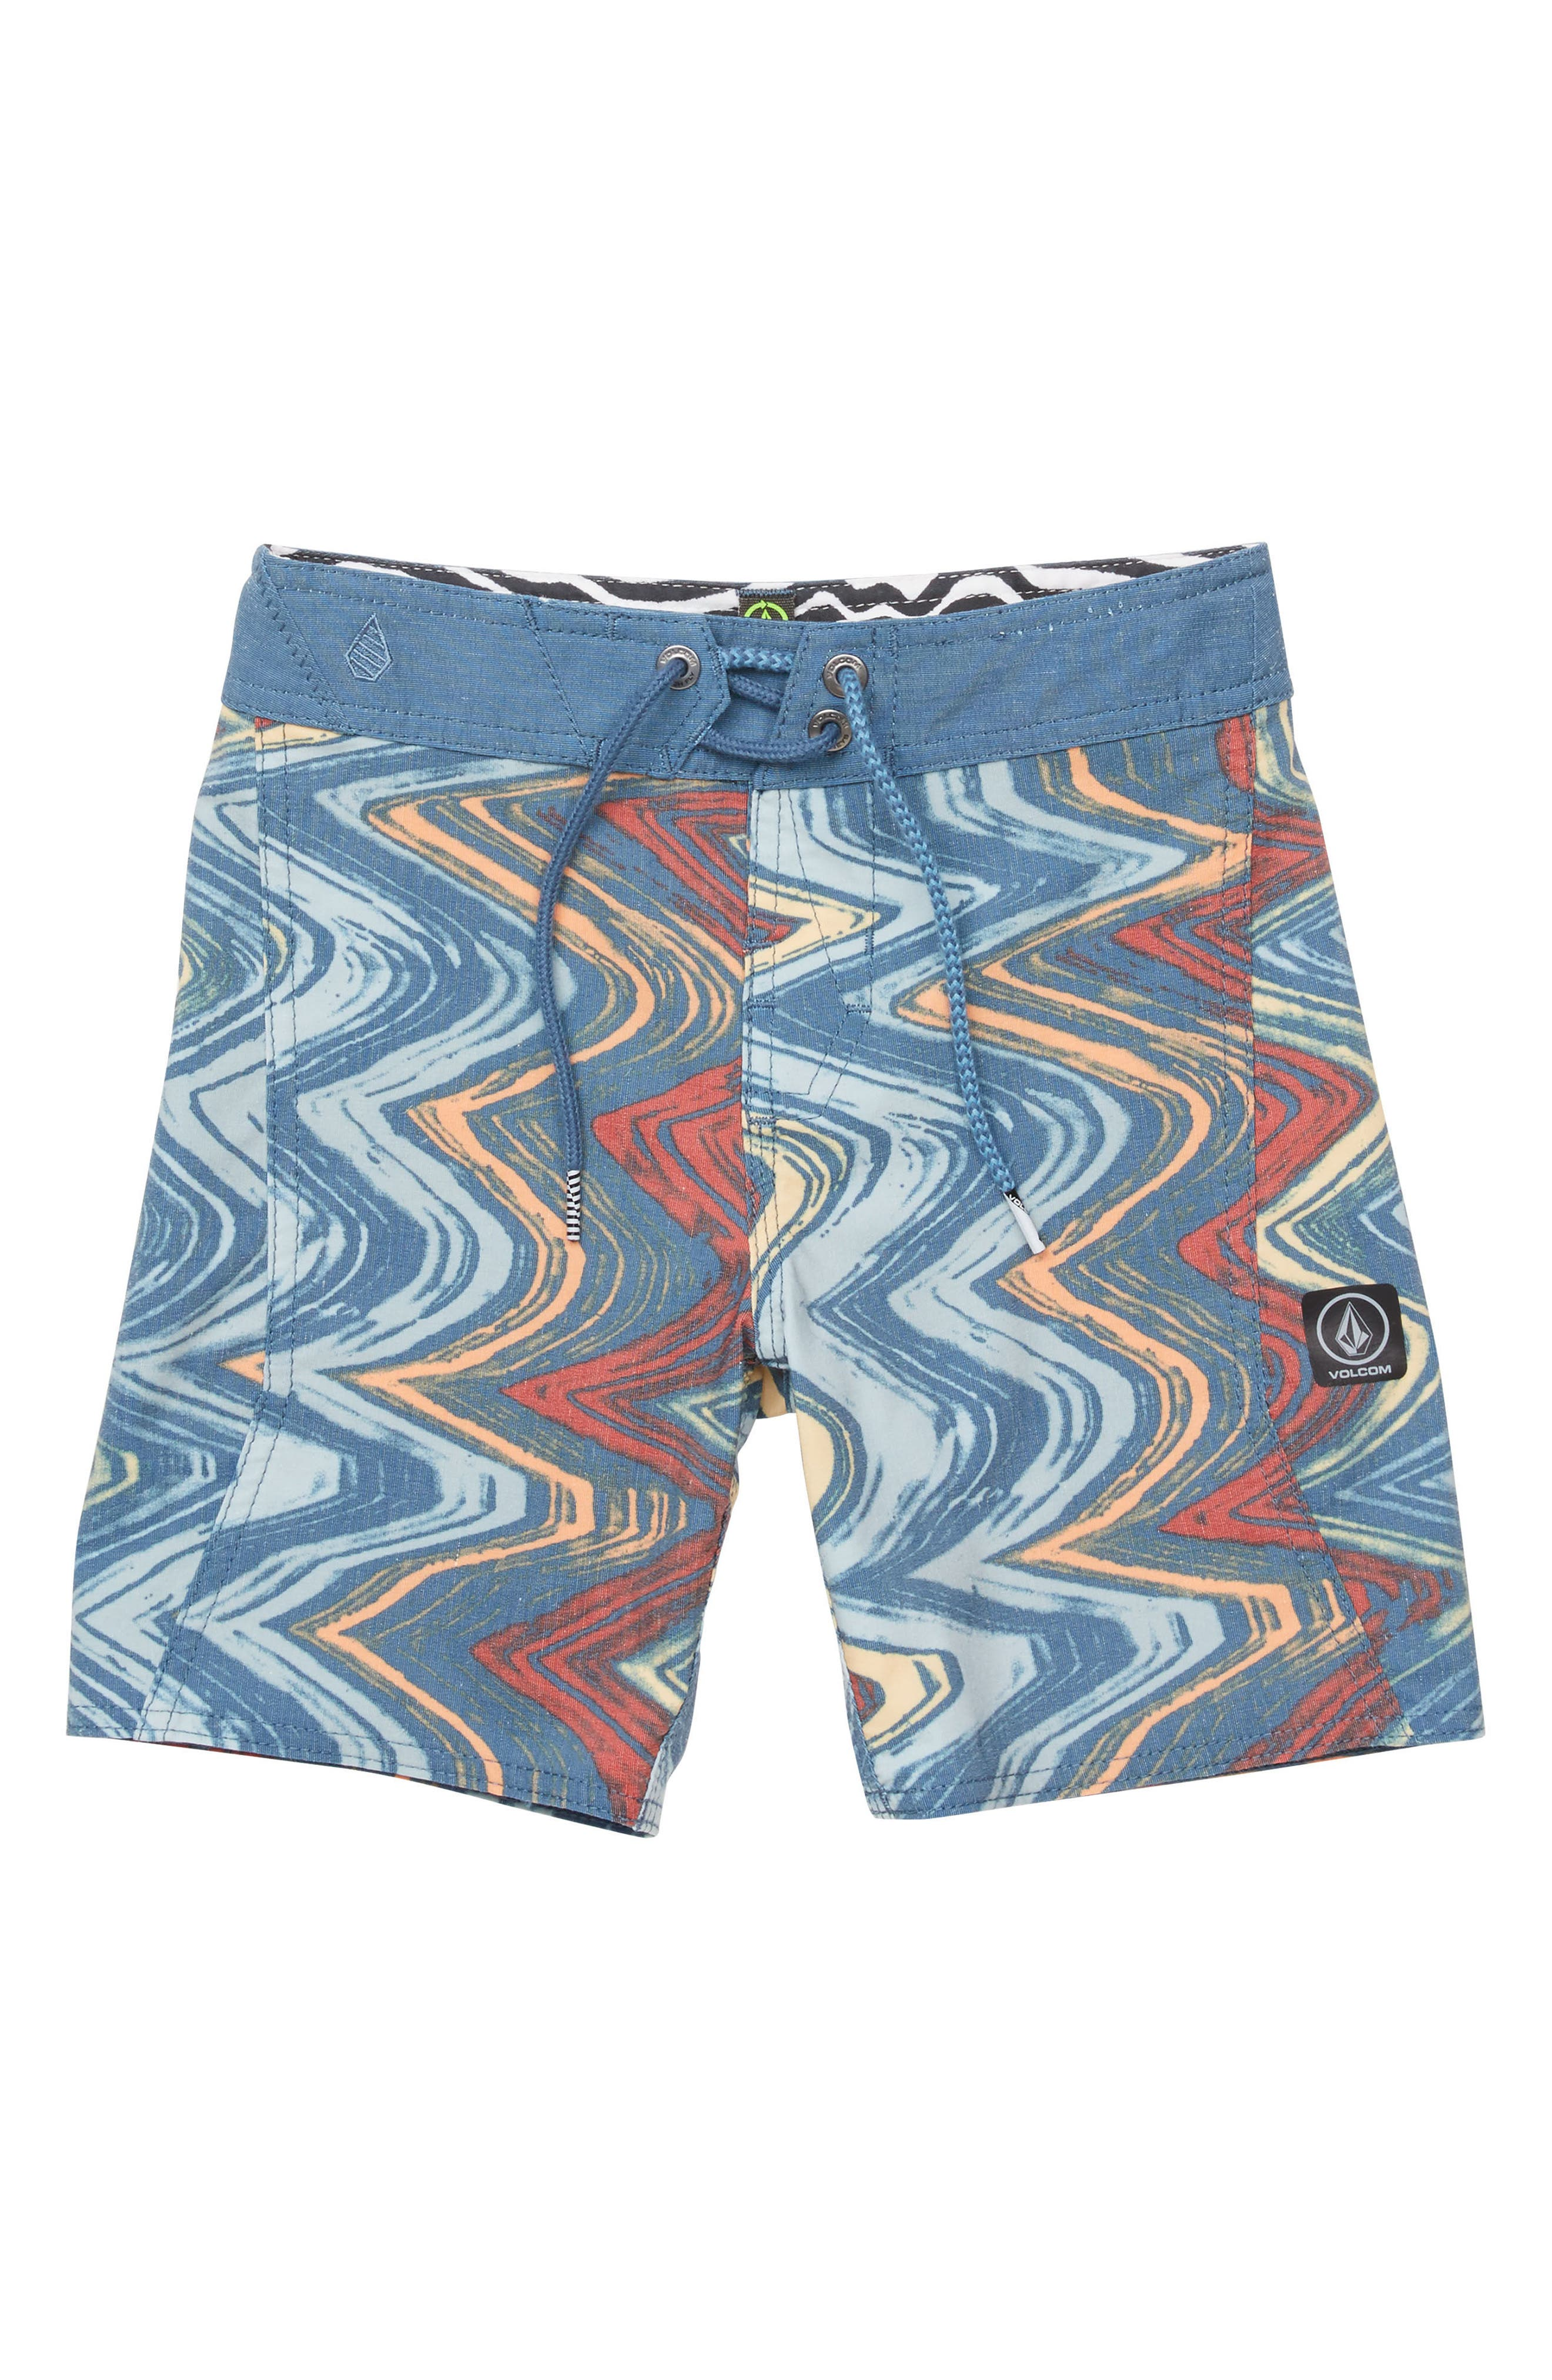 Lo-Fi Board Shorts,                             Main thumbnail 1, color,                             SUNBURST